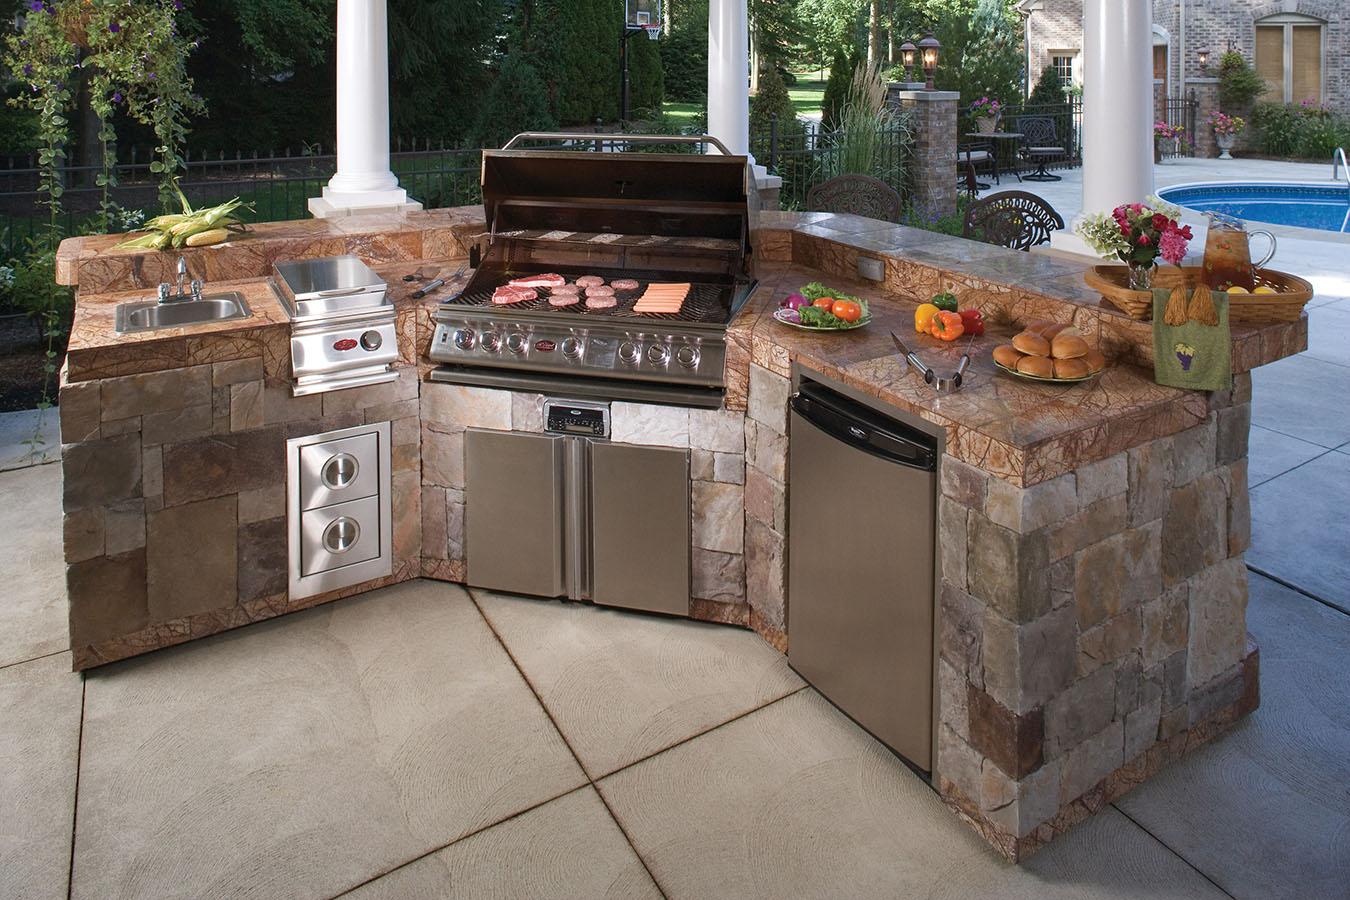 Modular Outdoor Kitchens Lowes Cal Flame Blog Cal Flame Blog